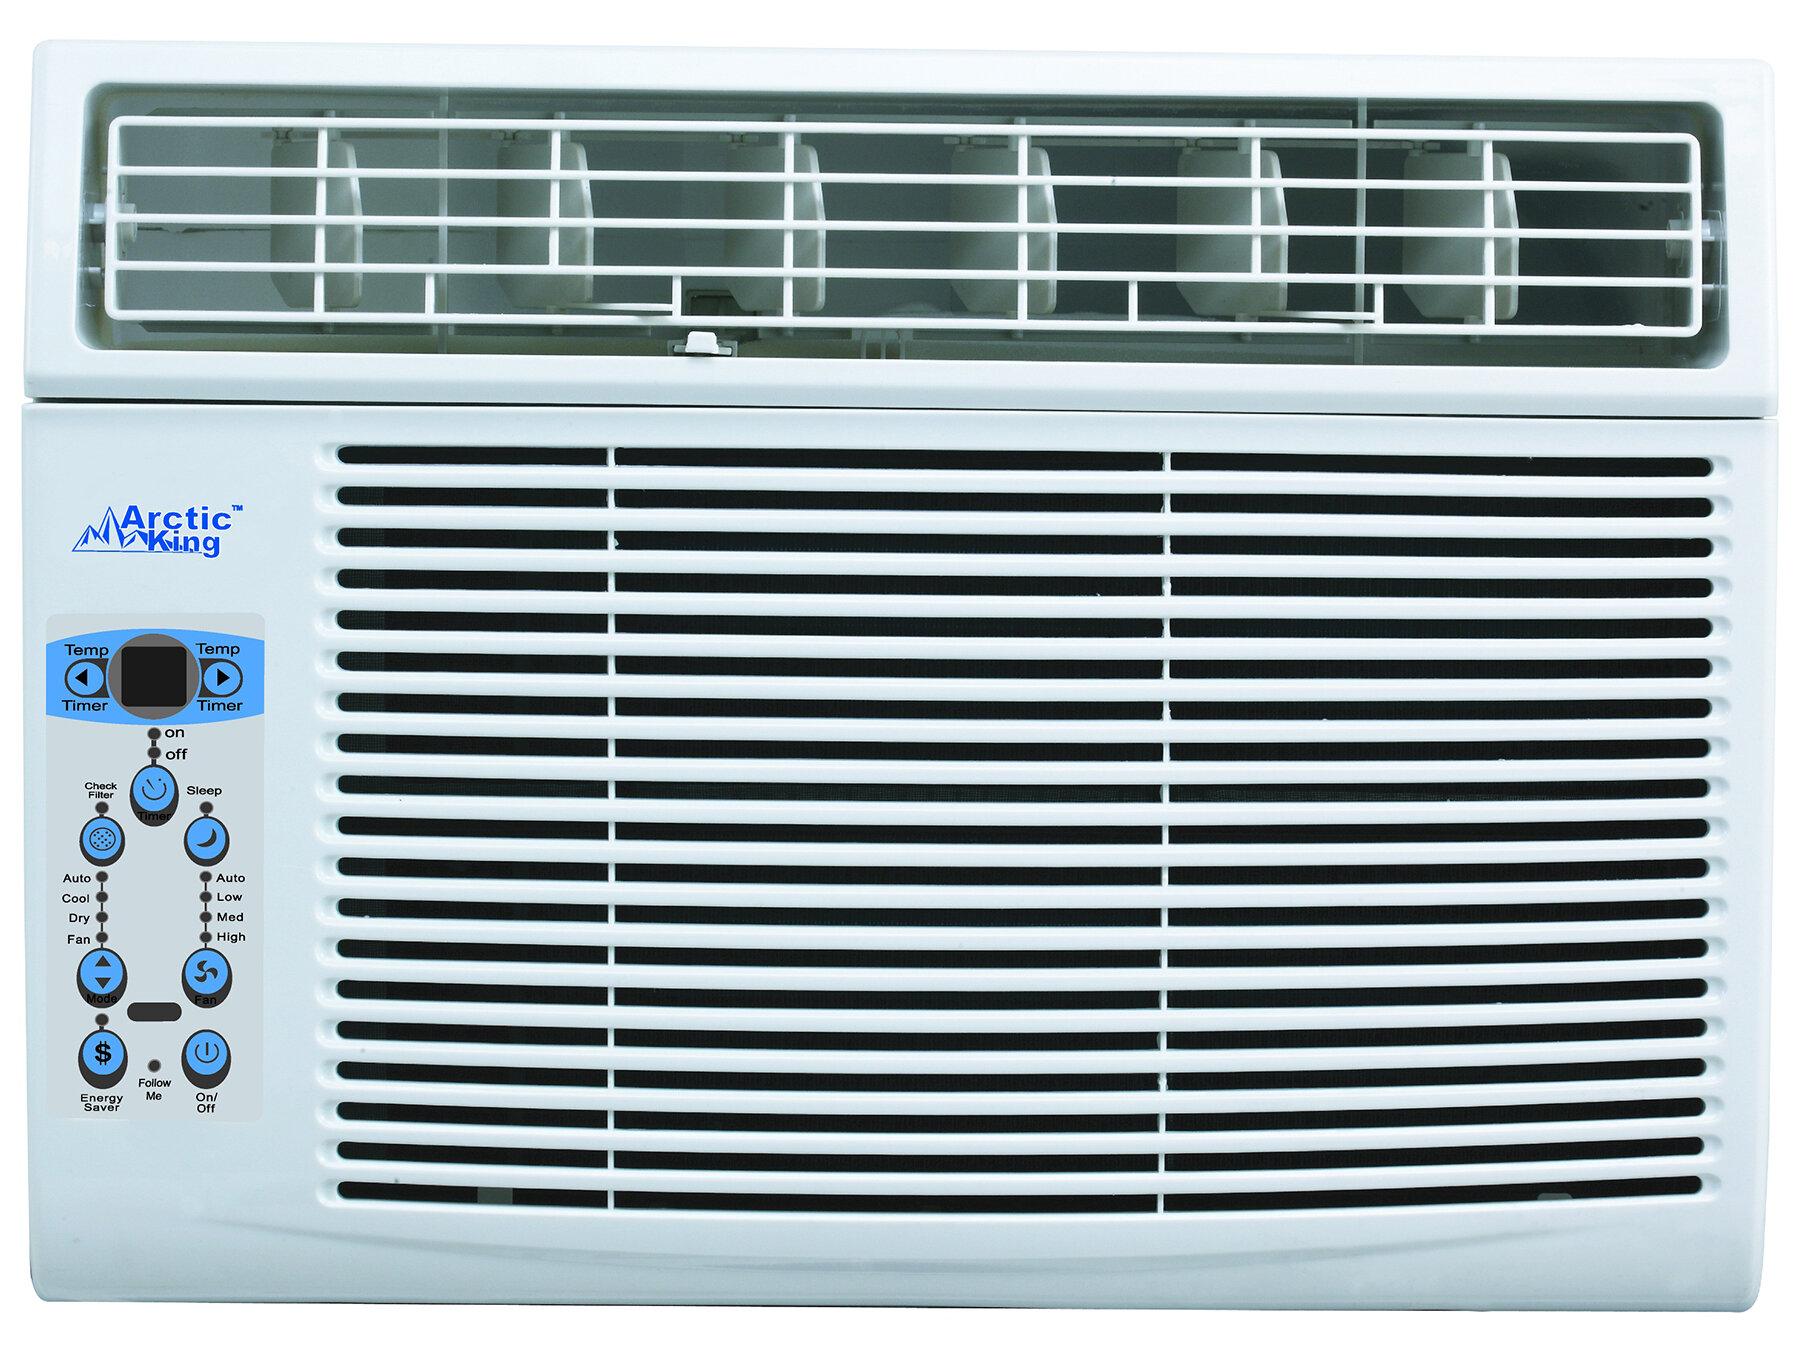 Arctic king 10 000 btu energy star window air conditioner for 120v window air conditioner